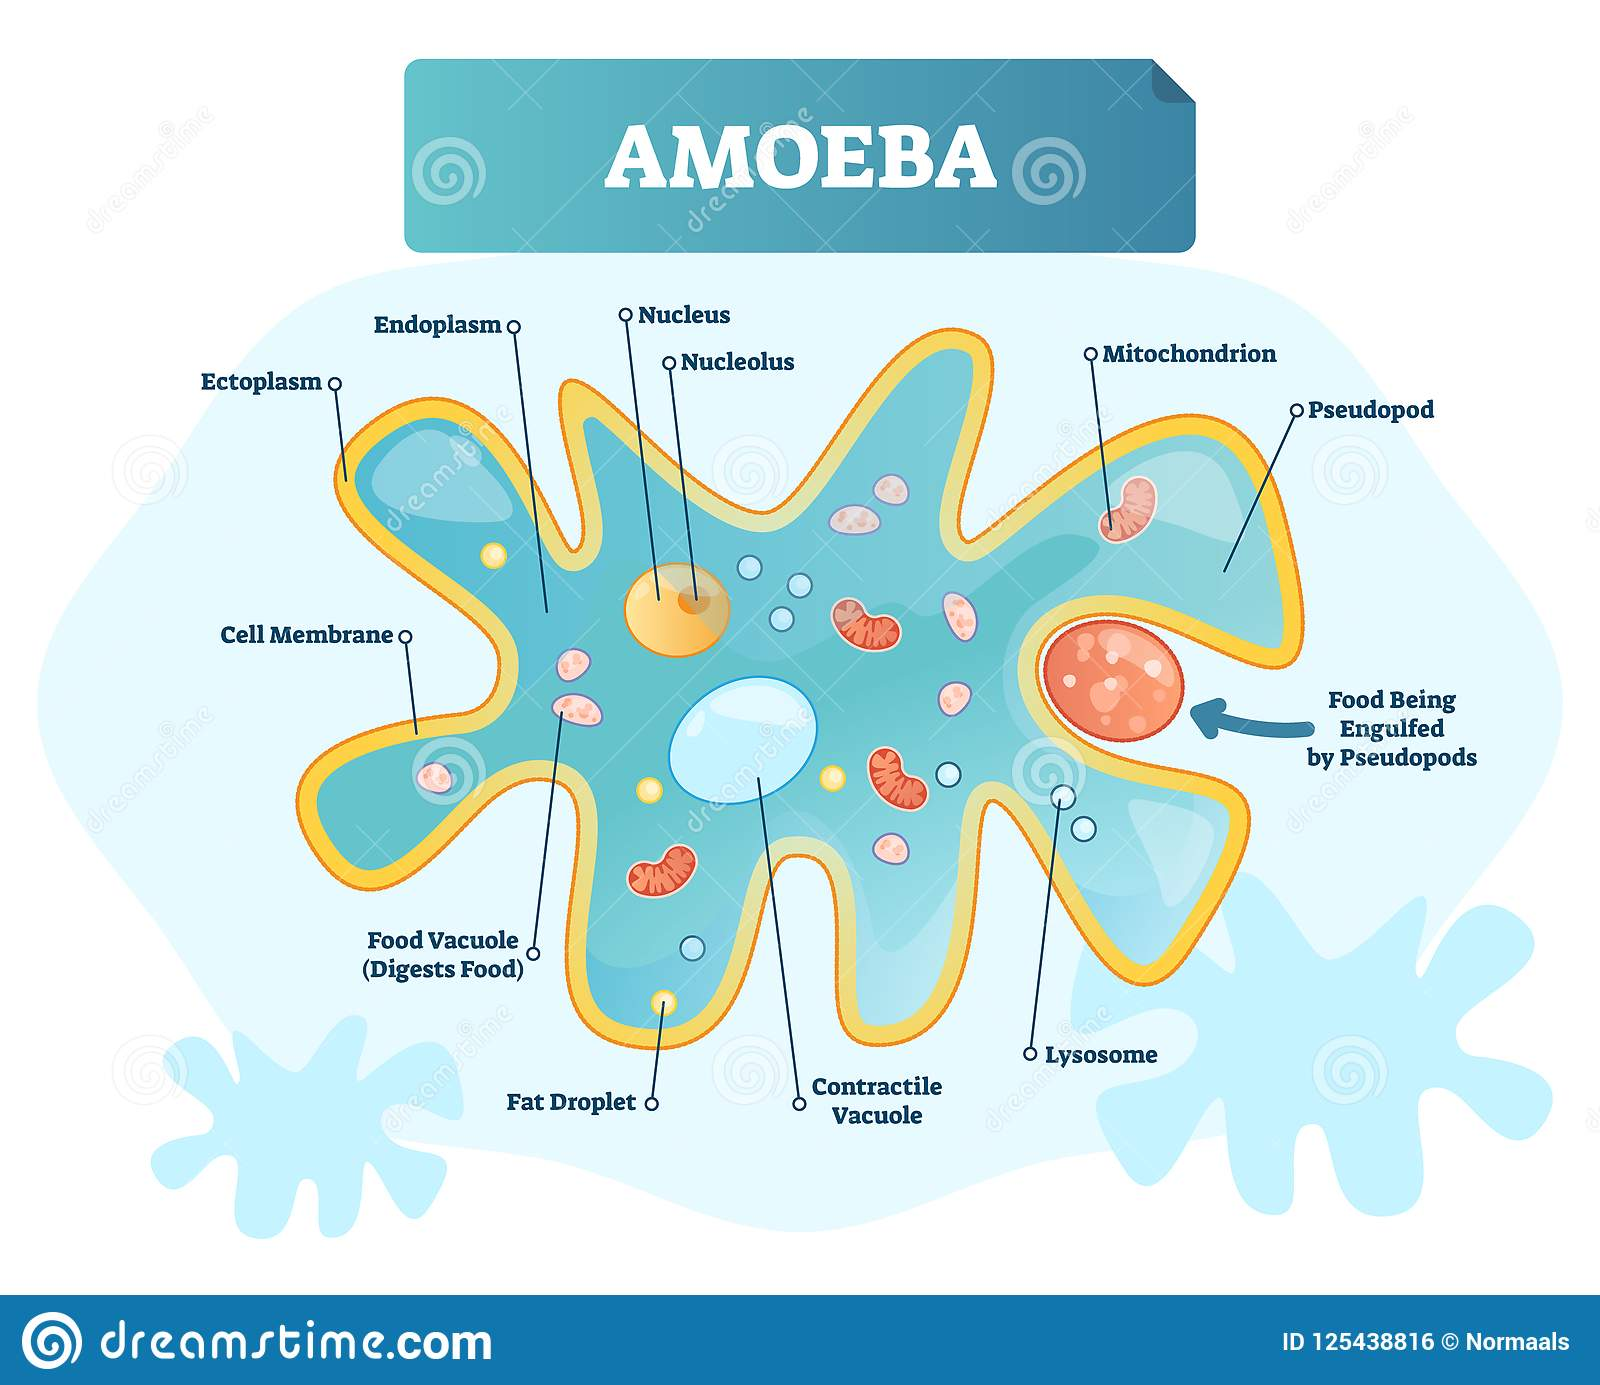 Amoeba Cartoons  Illustrations  U0026 Vector Stock Images